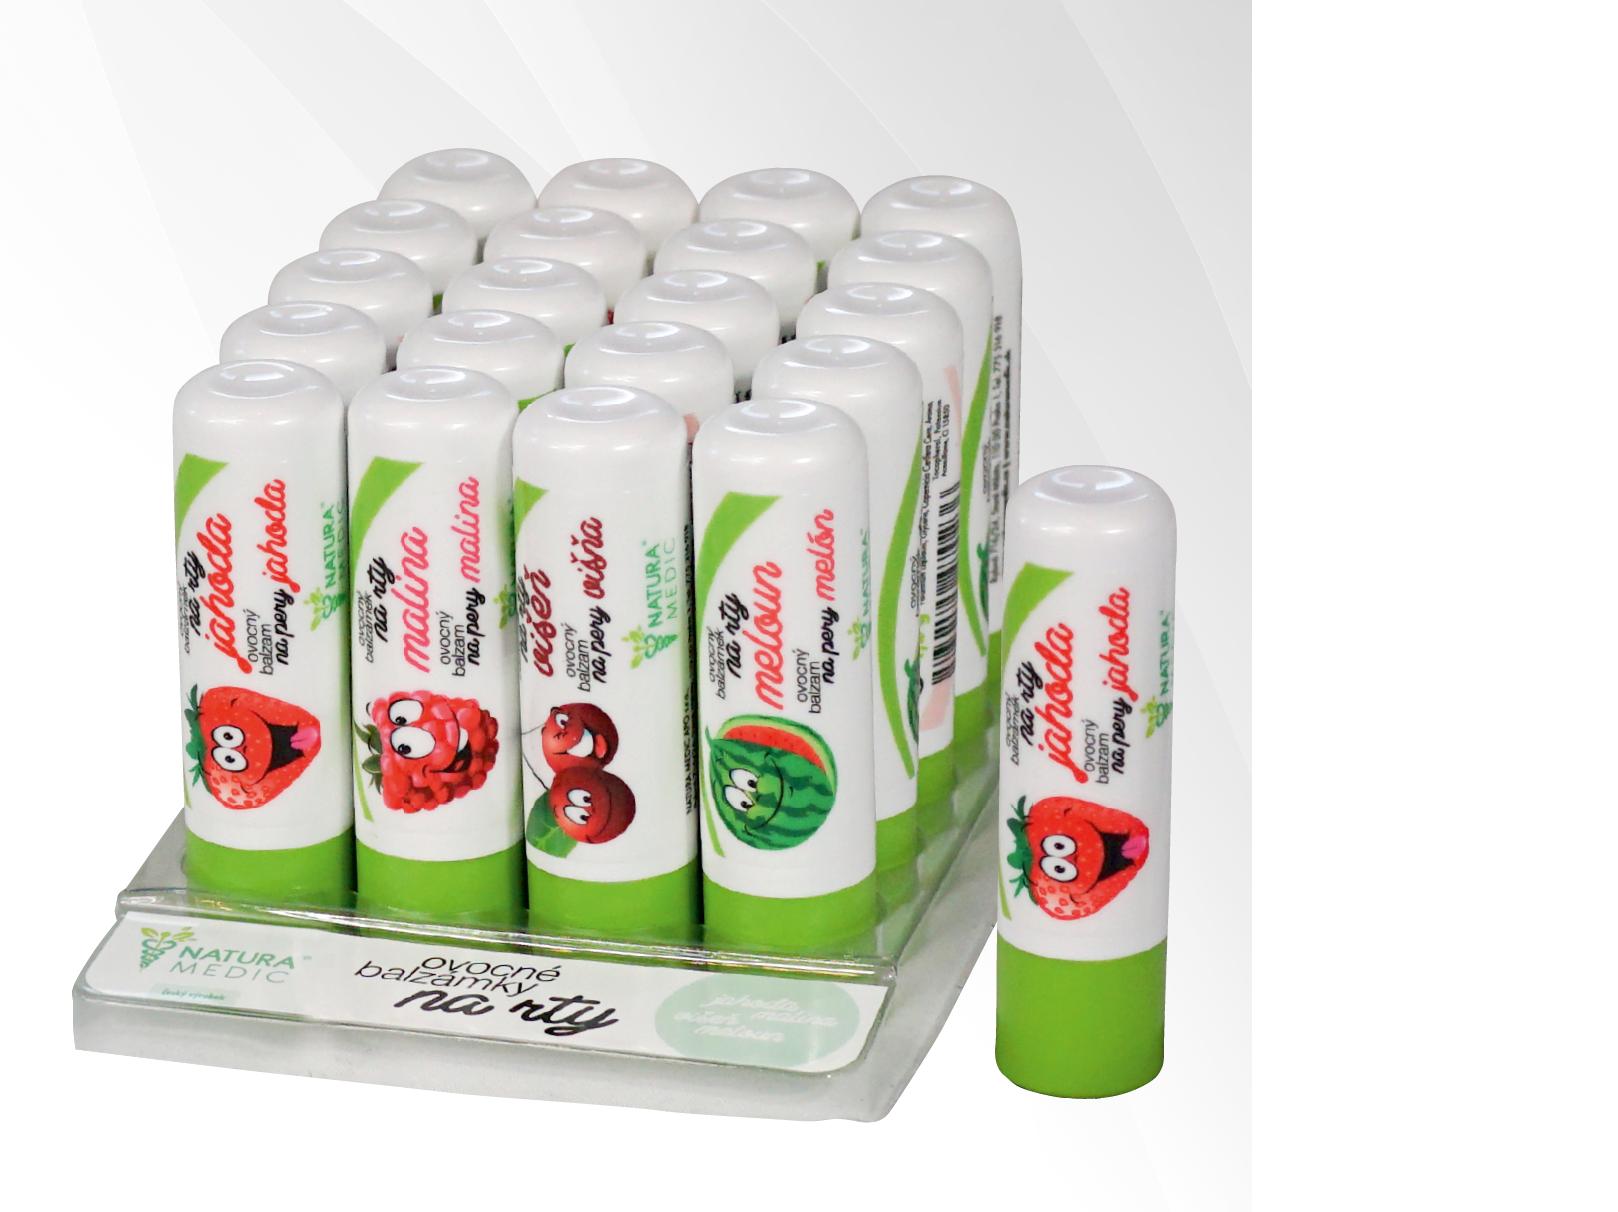 NATURA MEDIC Ovocný balzámek na rty - Jahoda